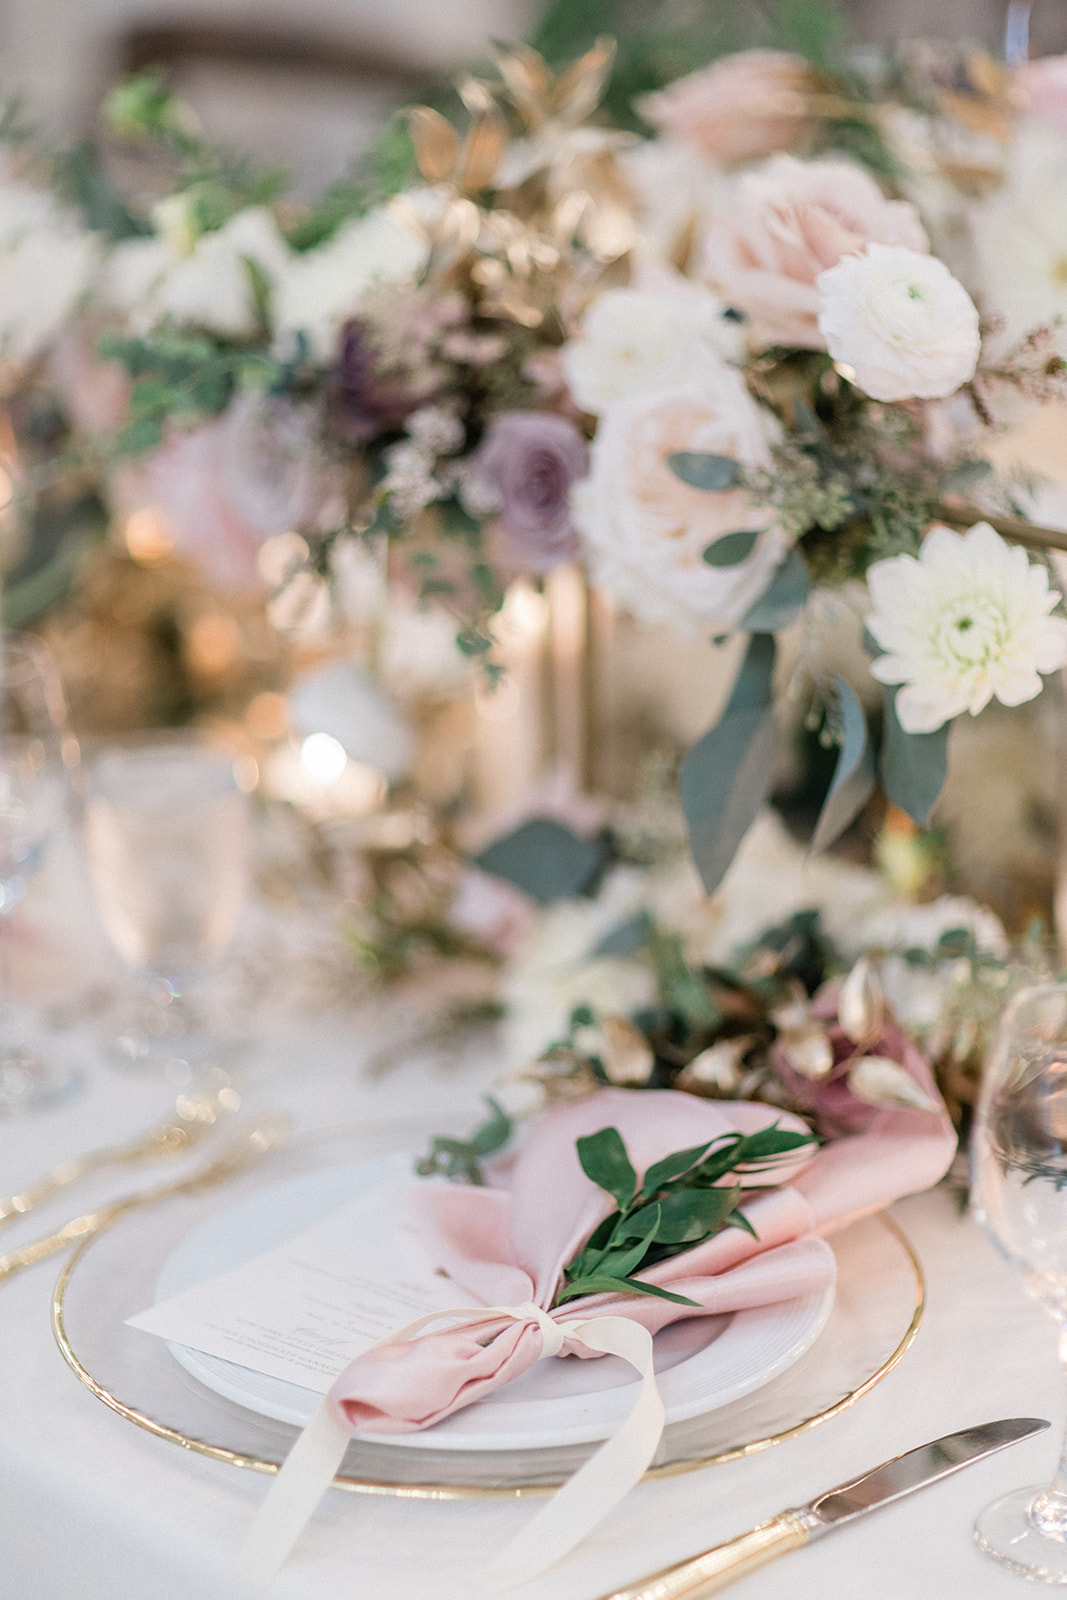 LisaCatherinePhotography_Jasmeen&Darren_Wedding-377_websize.jpg